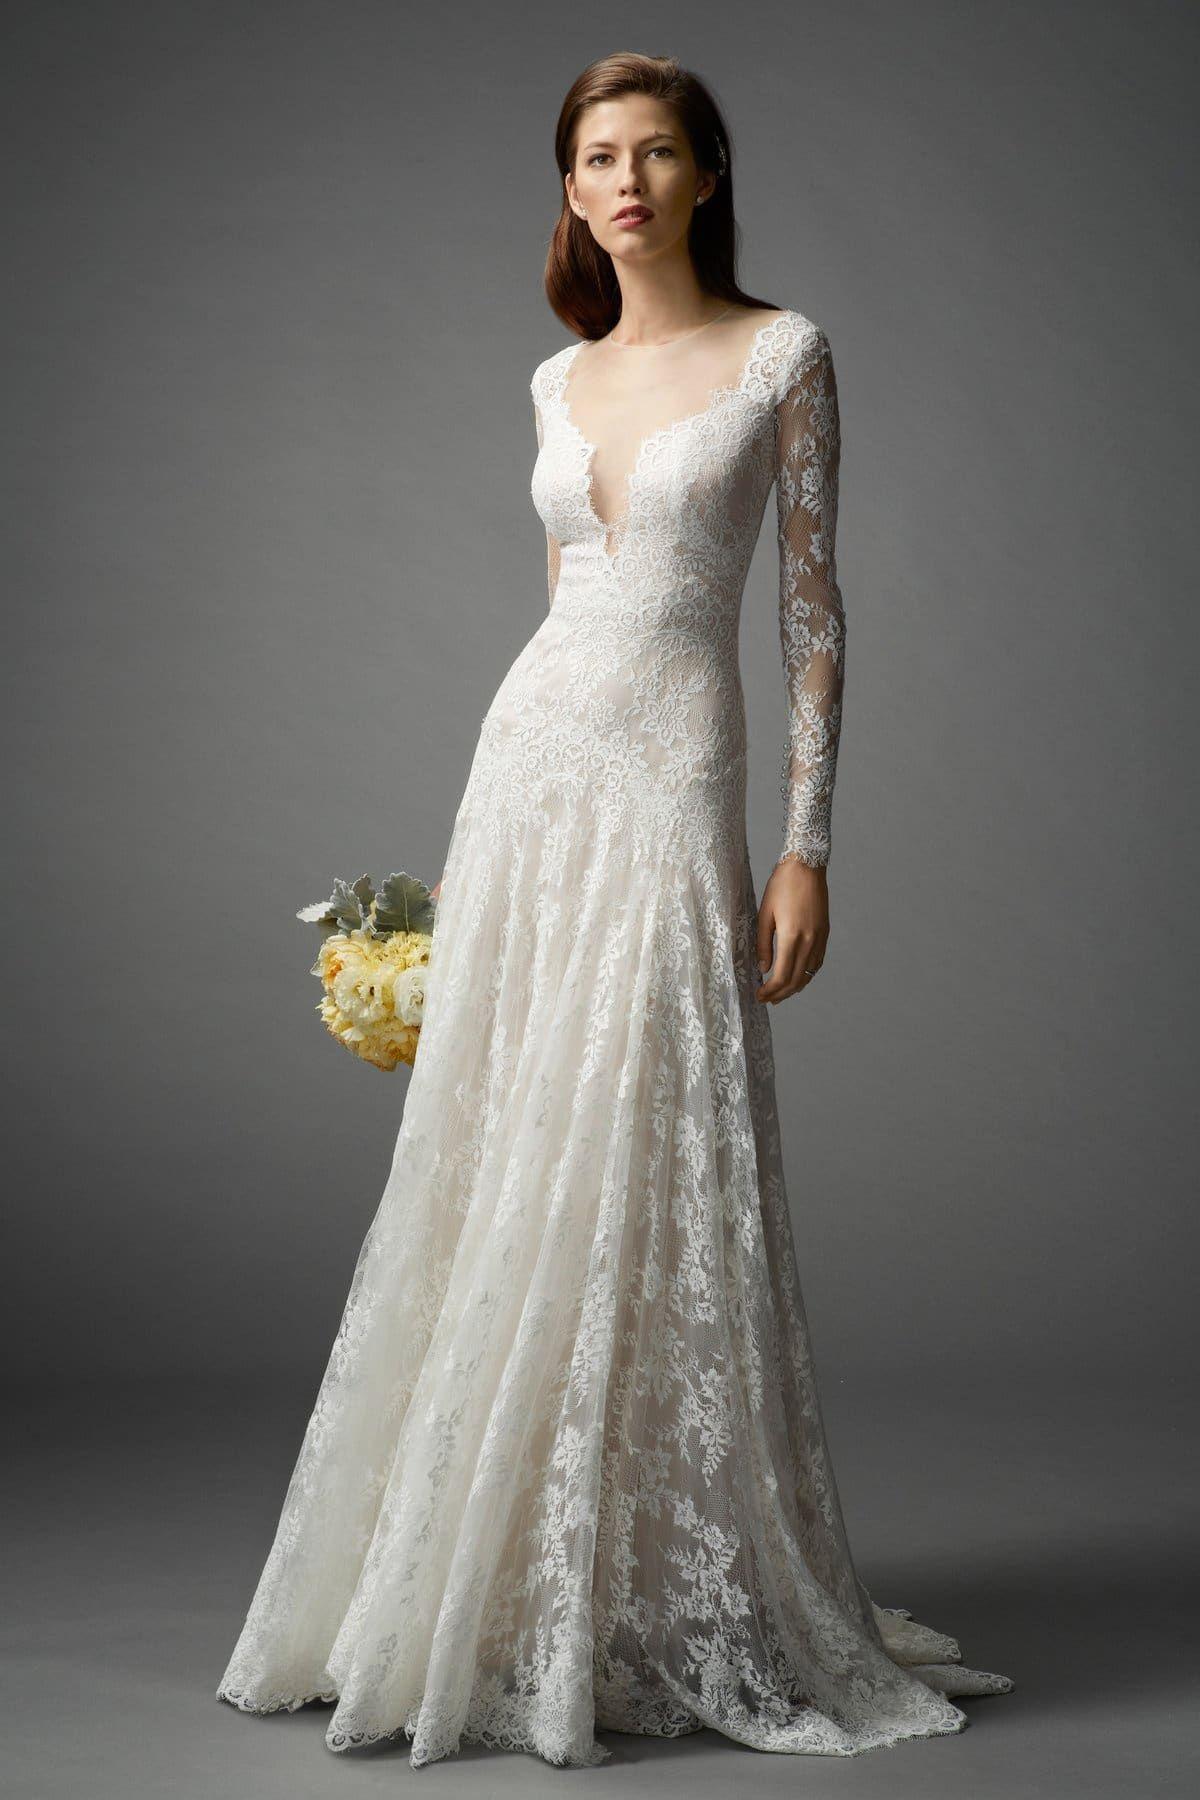 Long Sleeved Wedding Dresses We Love - Rustic Wedding Chic